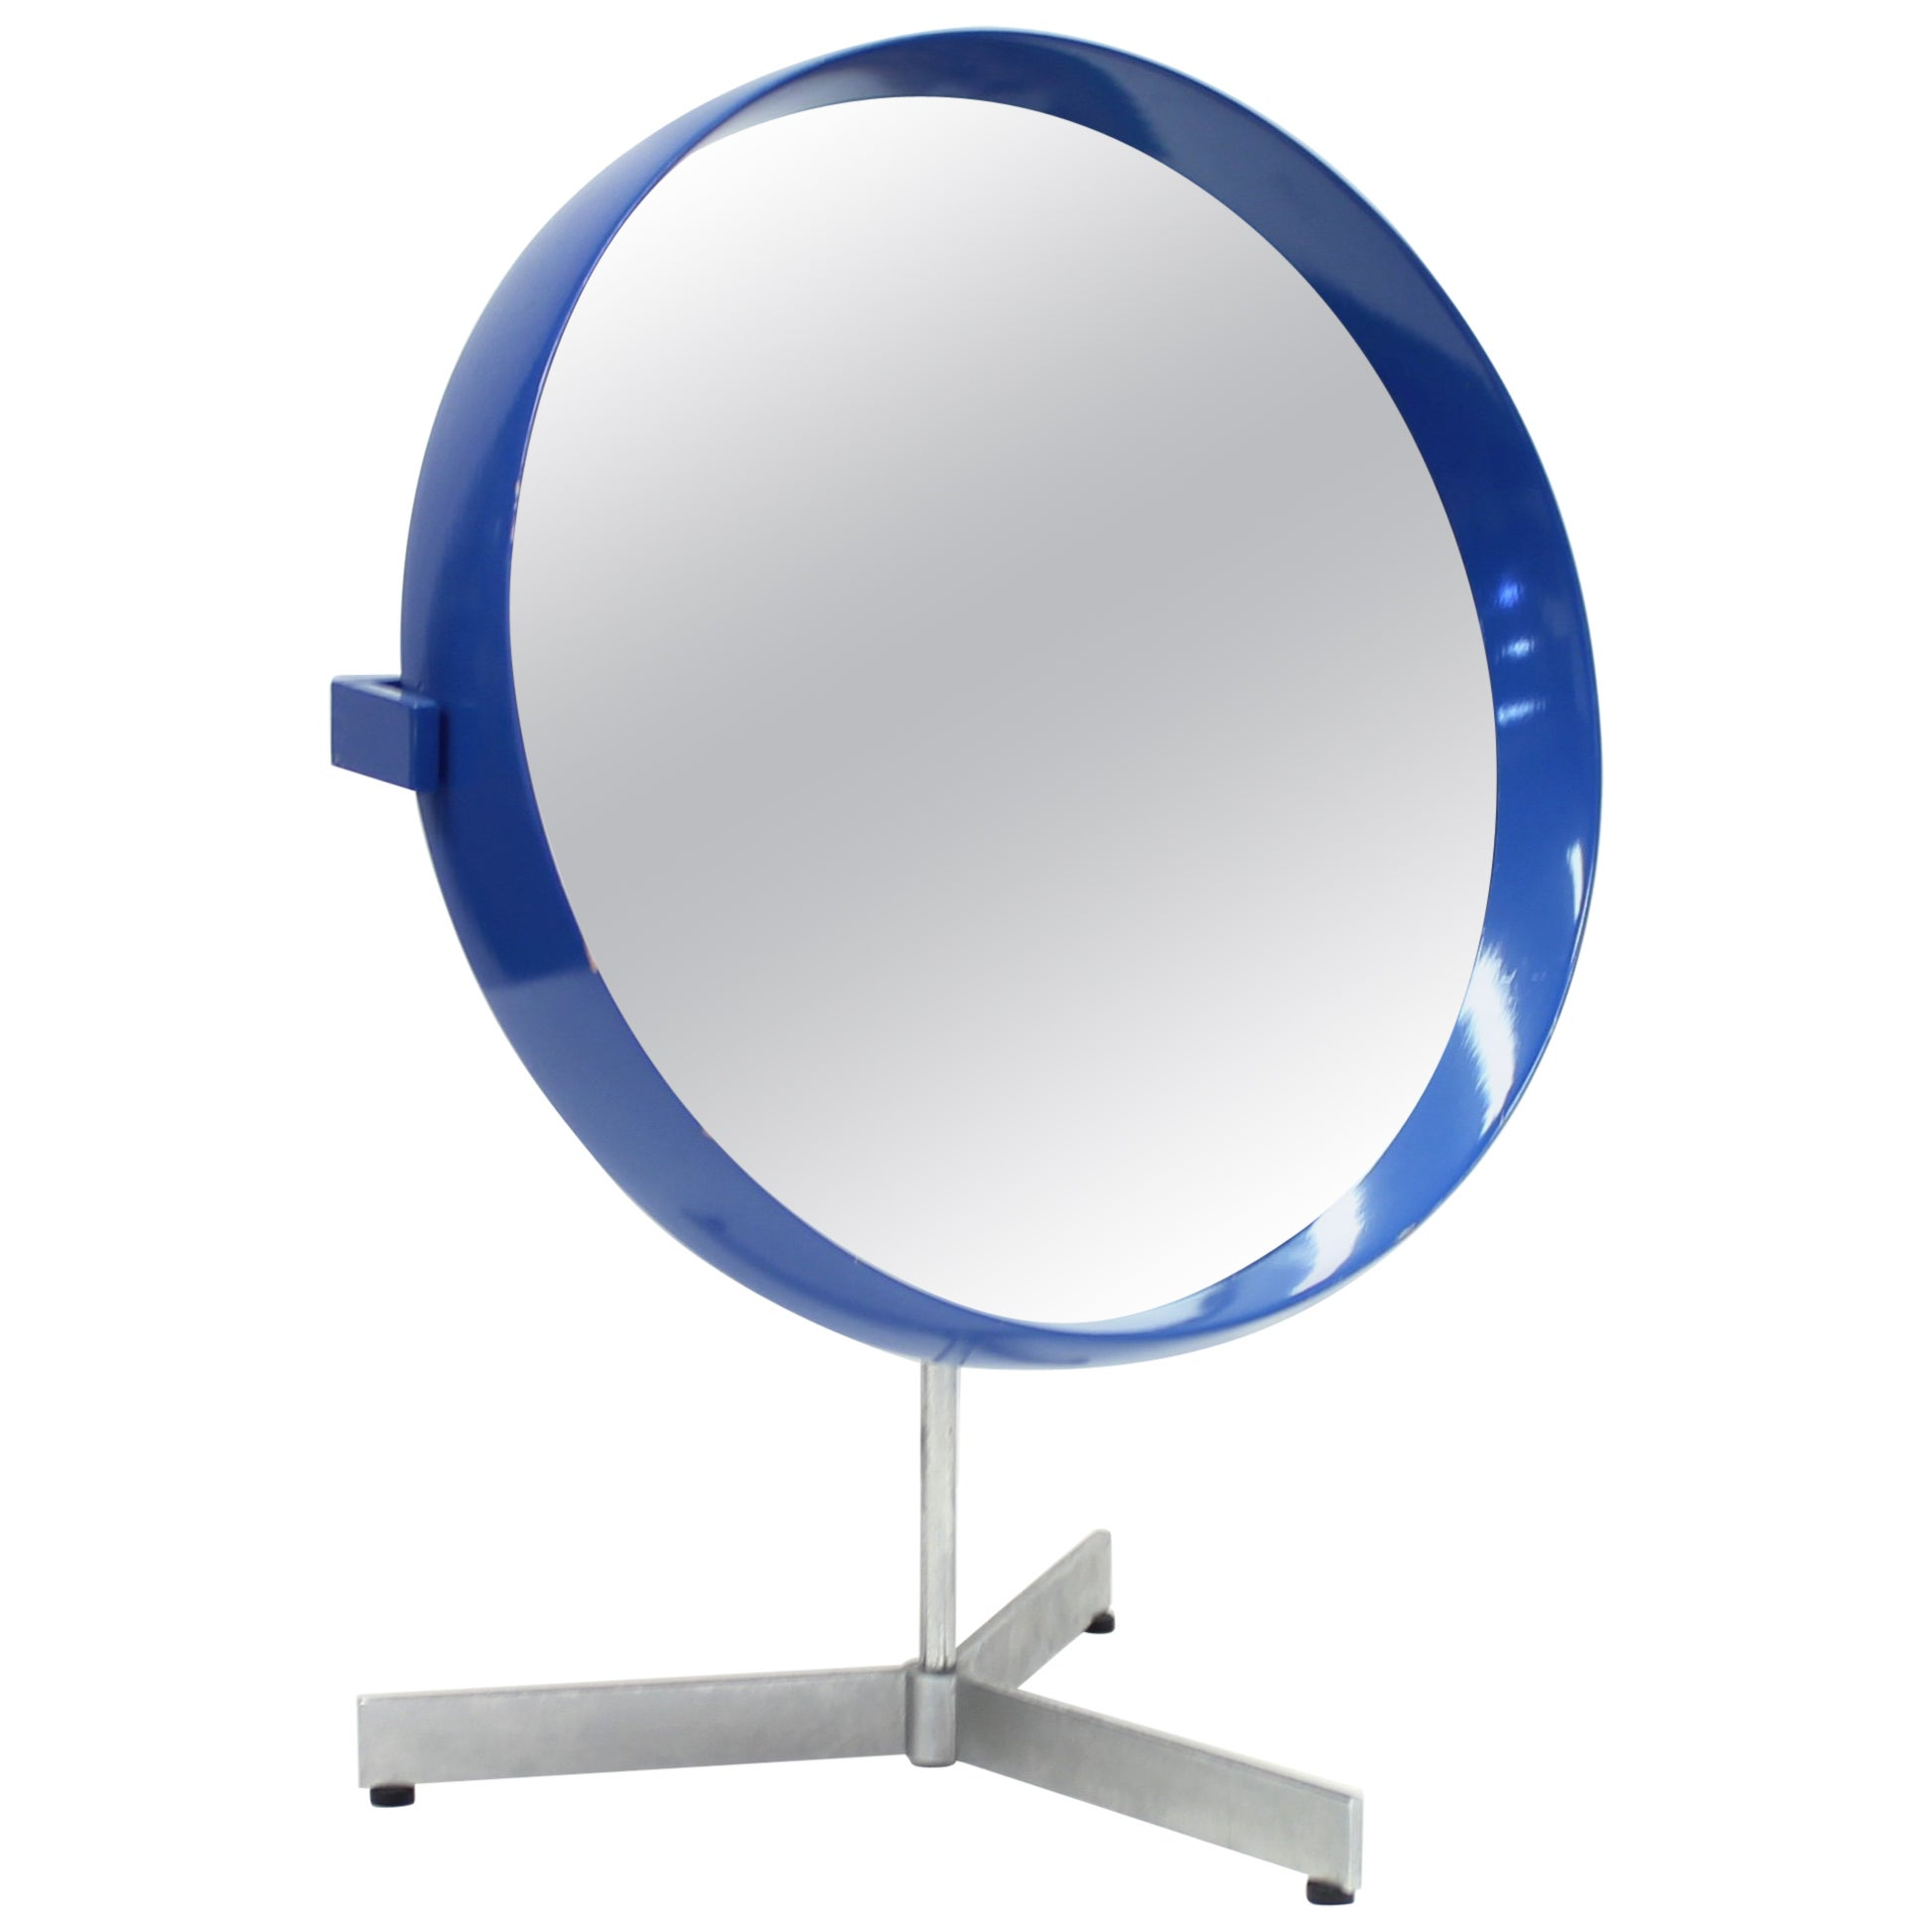 Table Mirror by Uno & Östen Kristiansson for Luxus Sweden, 1960s